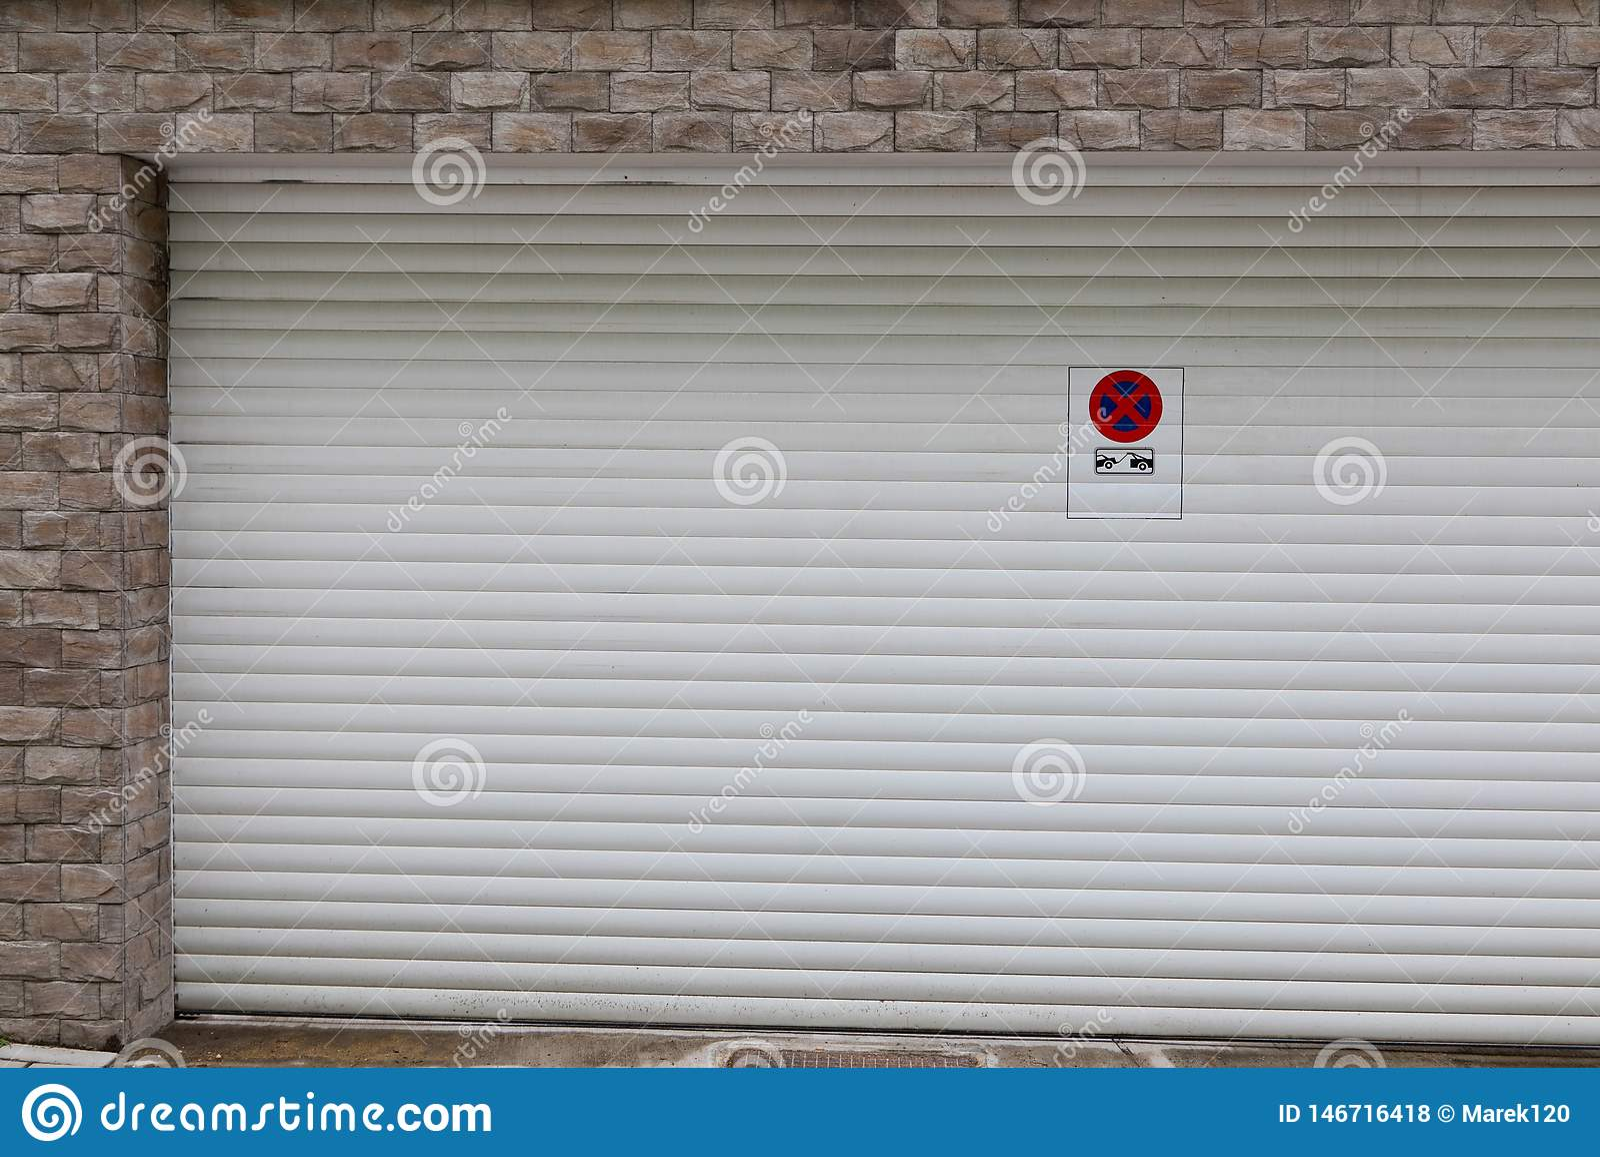 White garage door with no parking sign